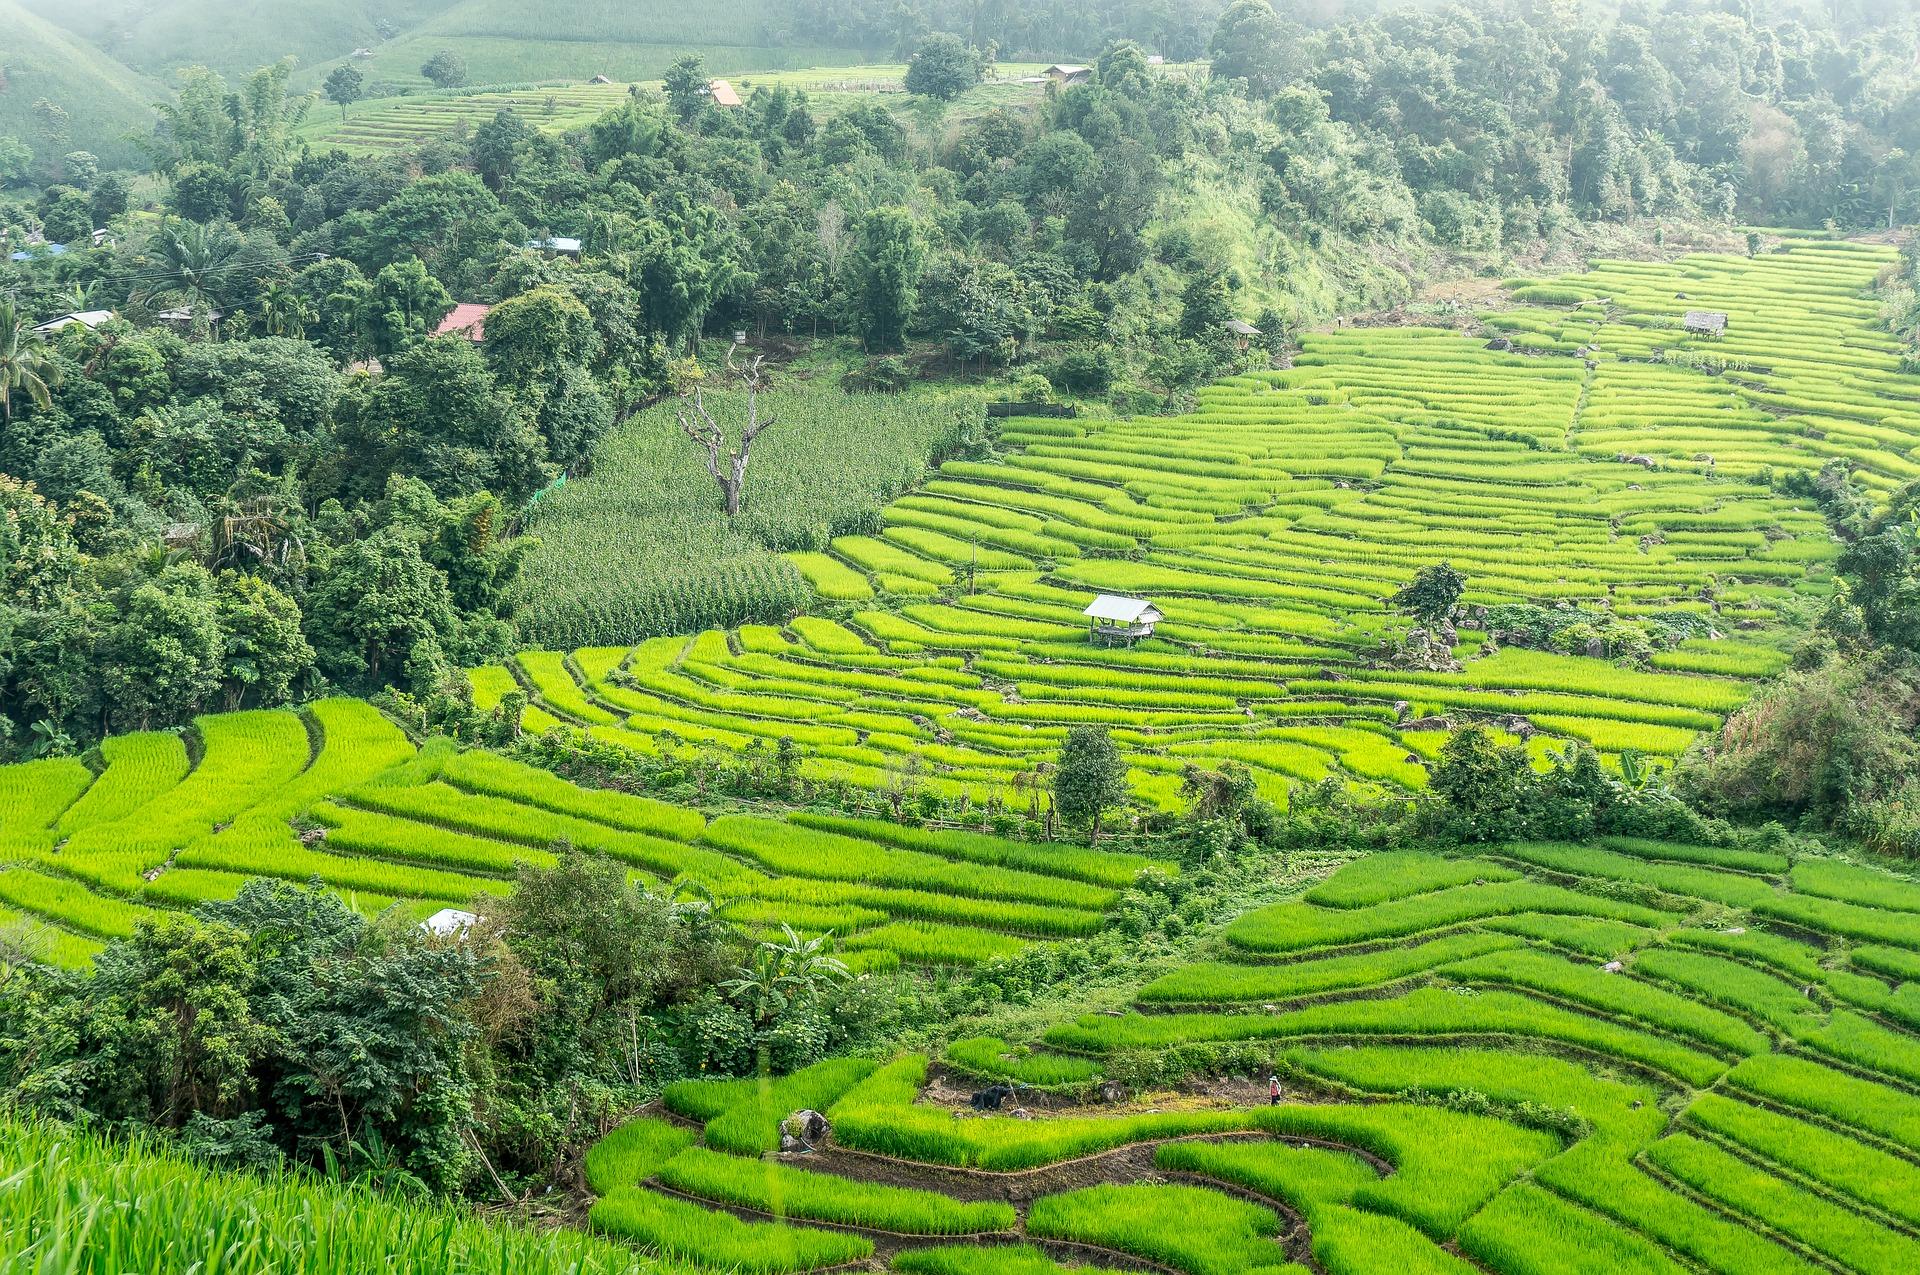 rice-terraces-2224264_1920.jpg